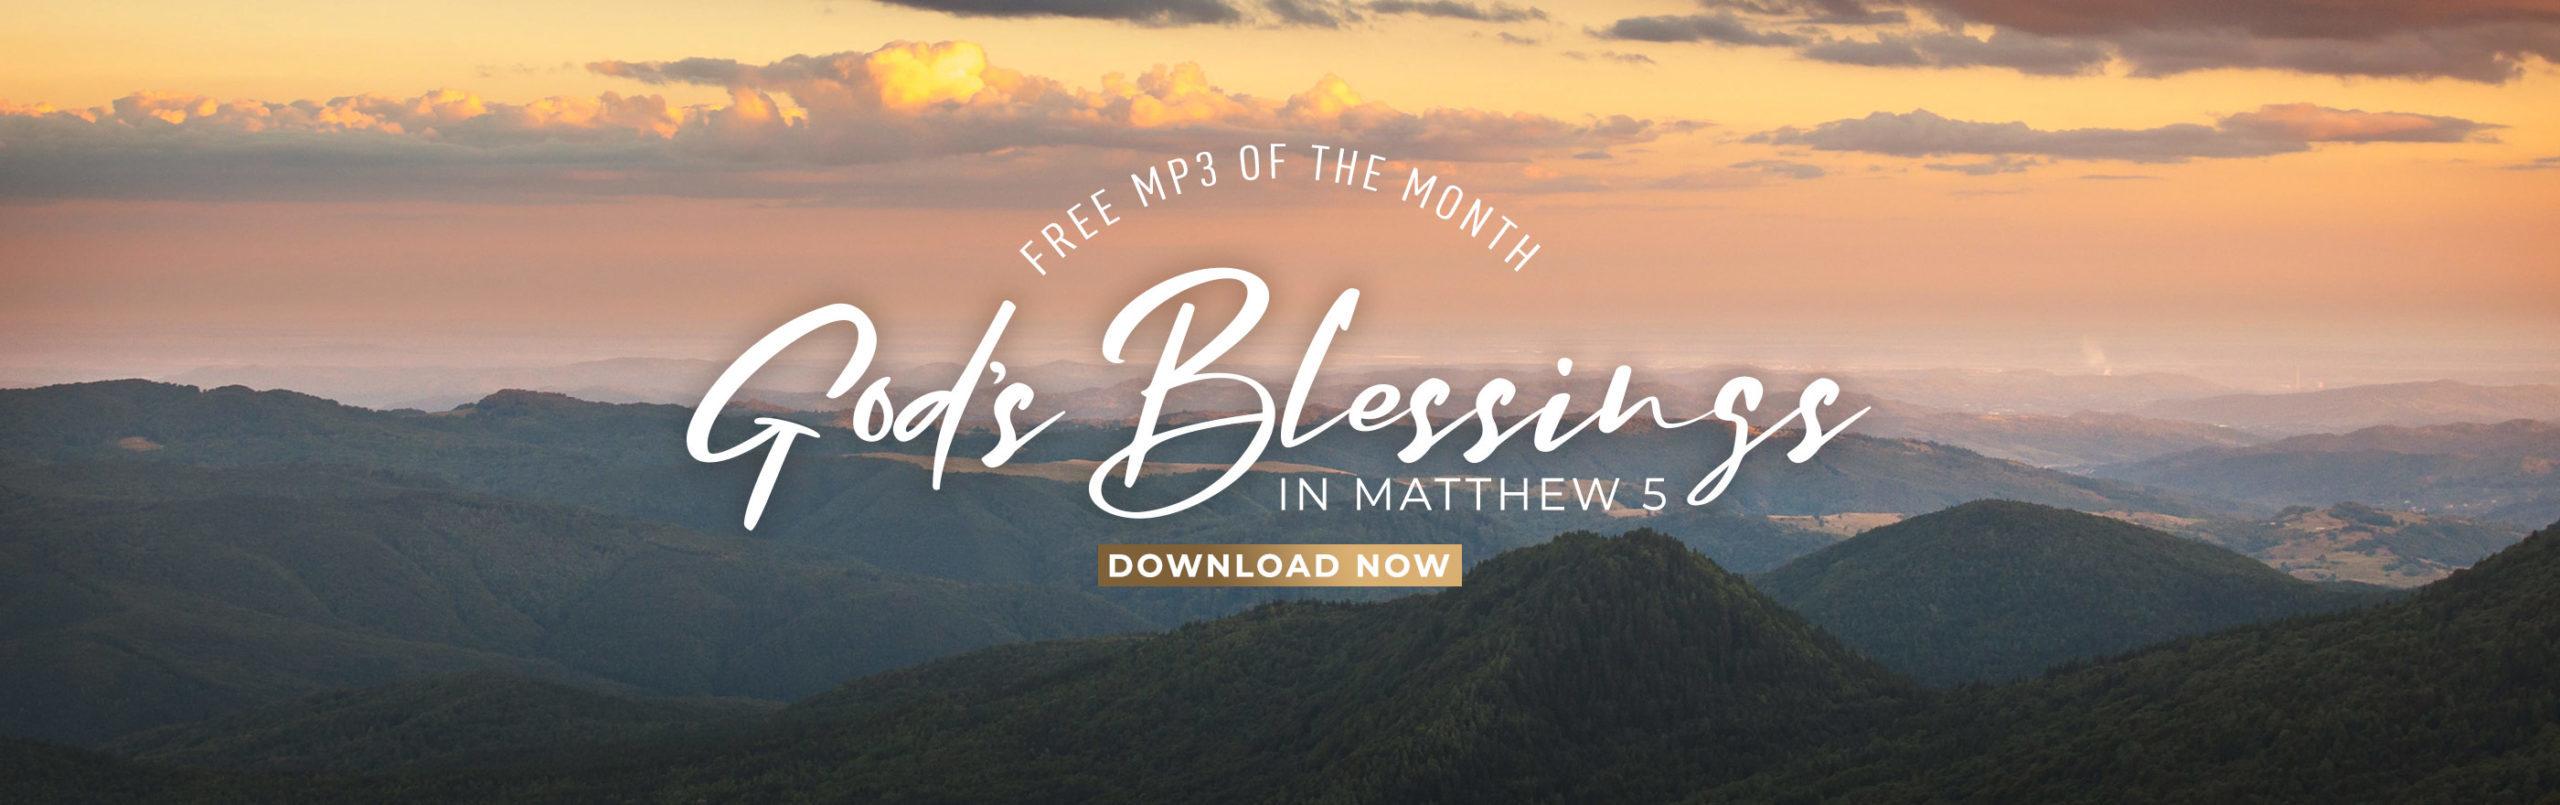 Free MP3: God's Blessings in Matthew 5